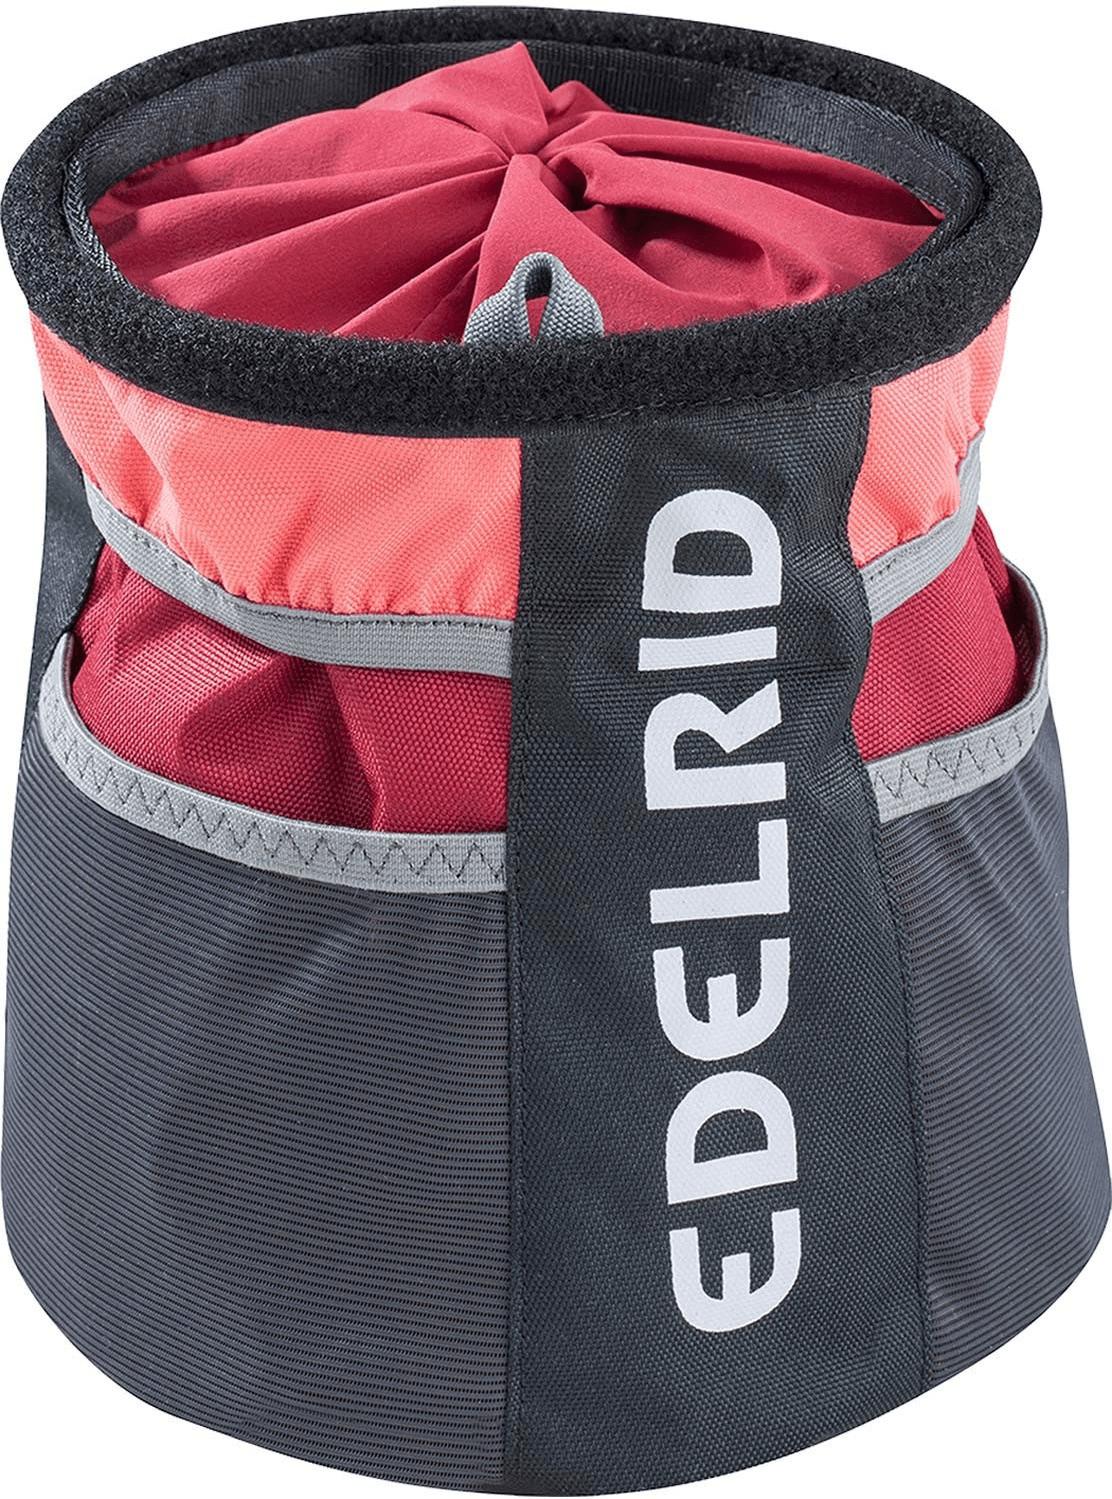 Edelrid Boulder Bag II (lollipop)